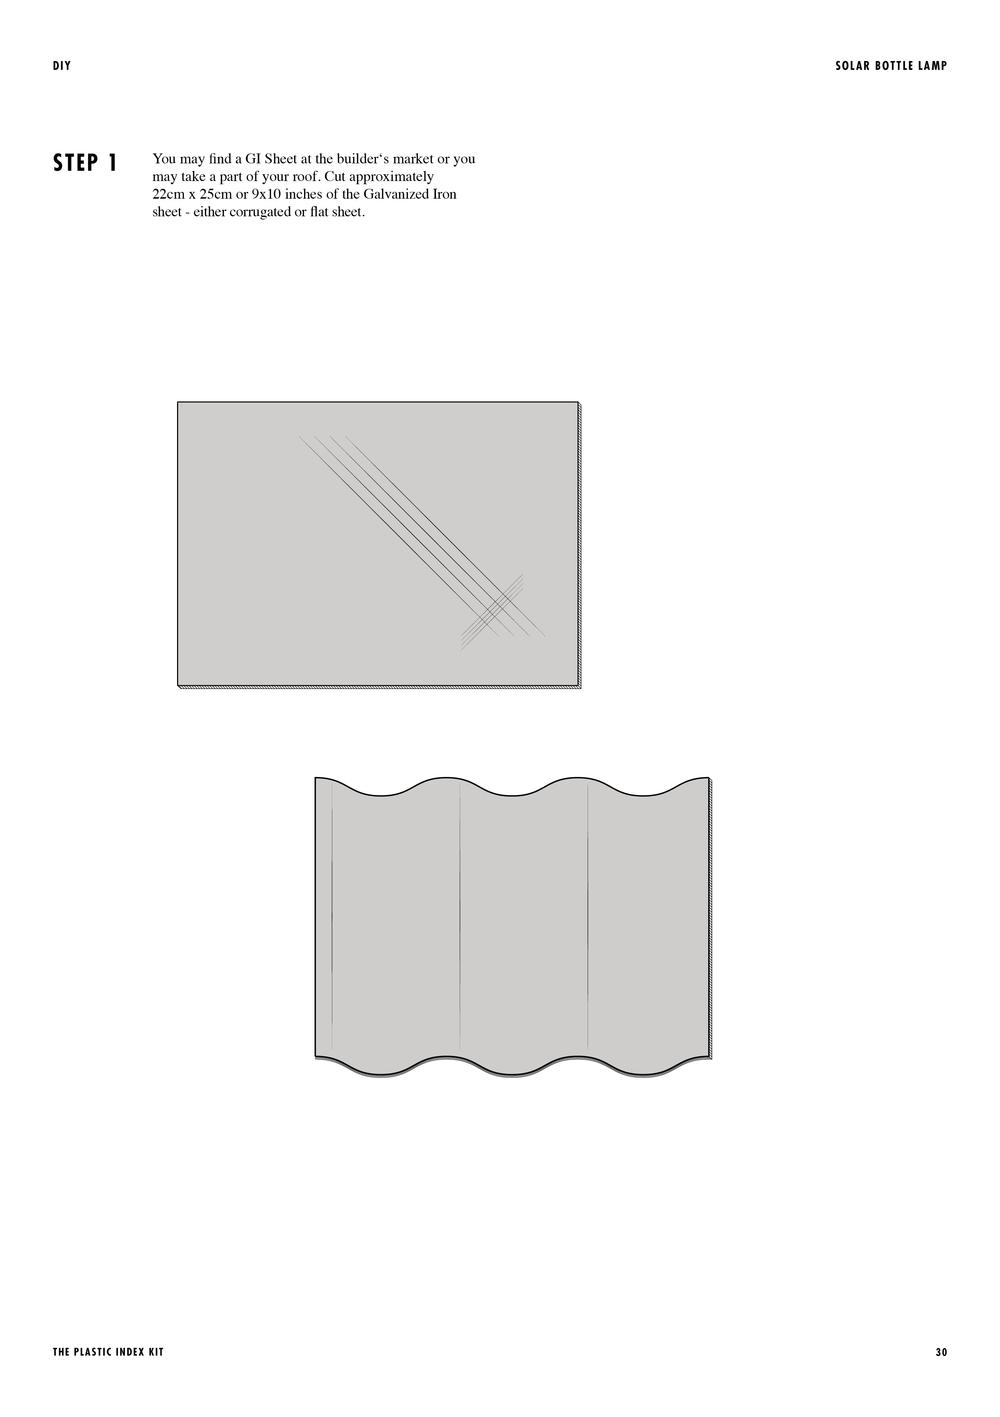 plasticindex_FINAL_single_141028_24x36_bw_p4030.jpg